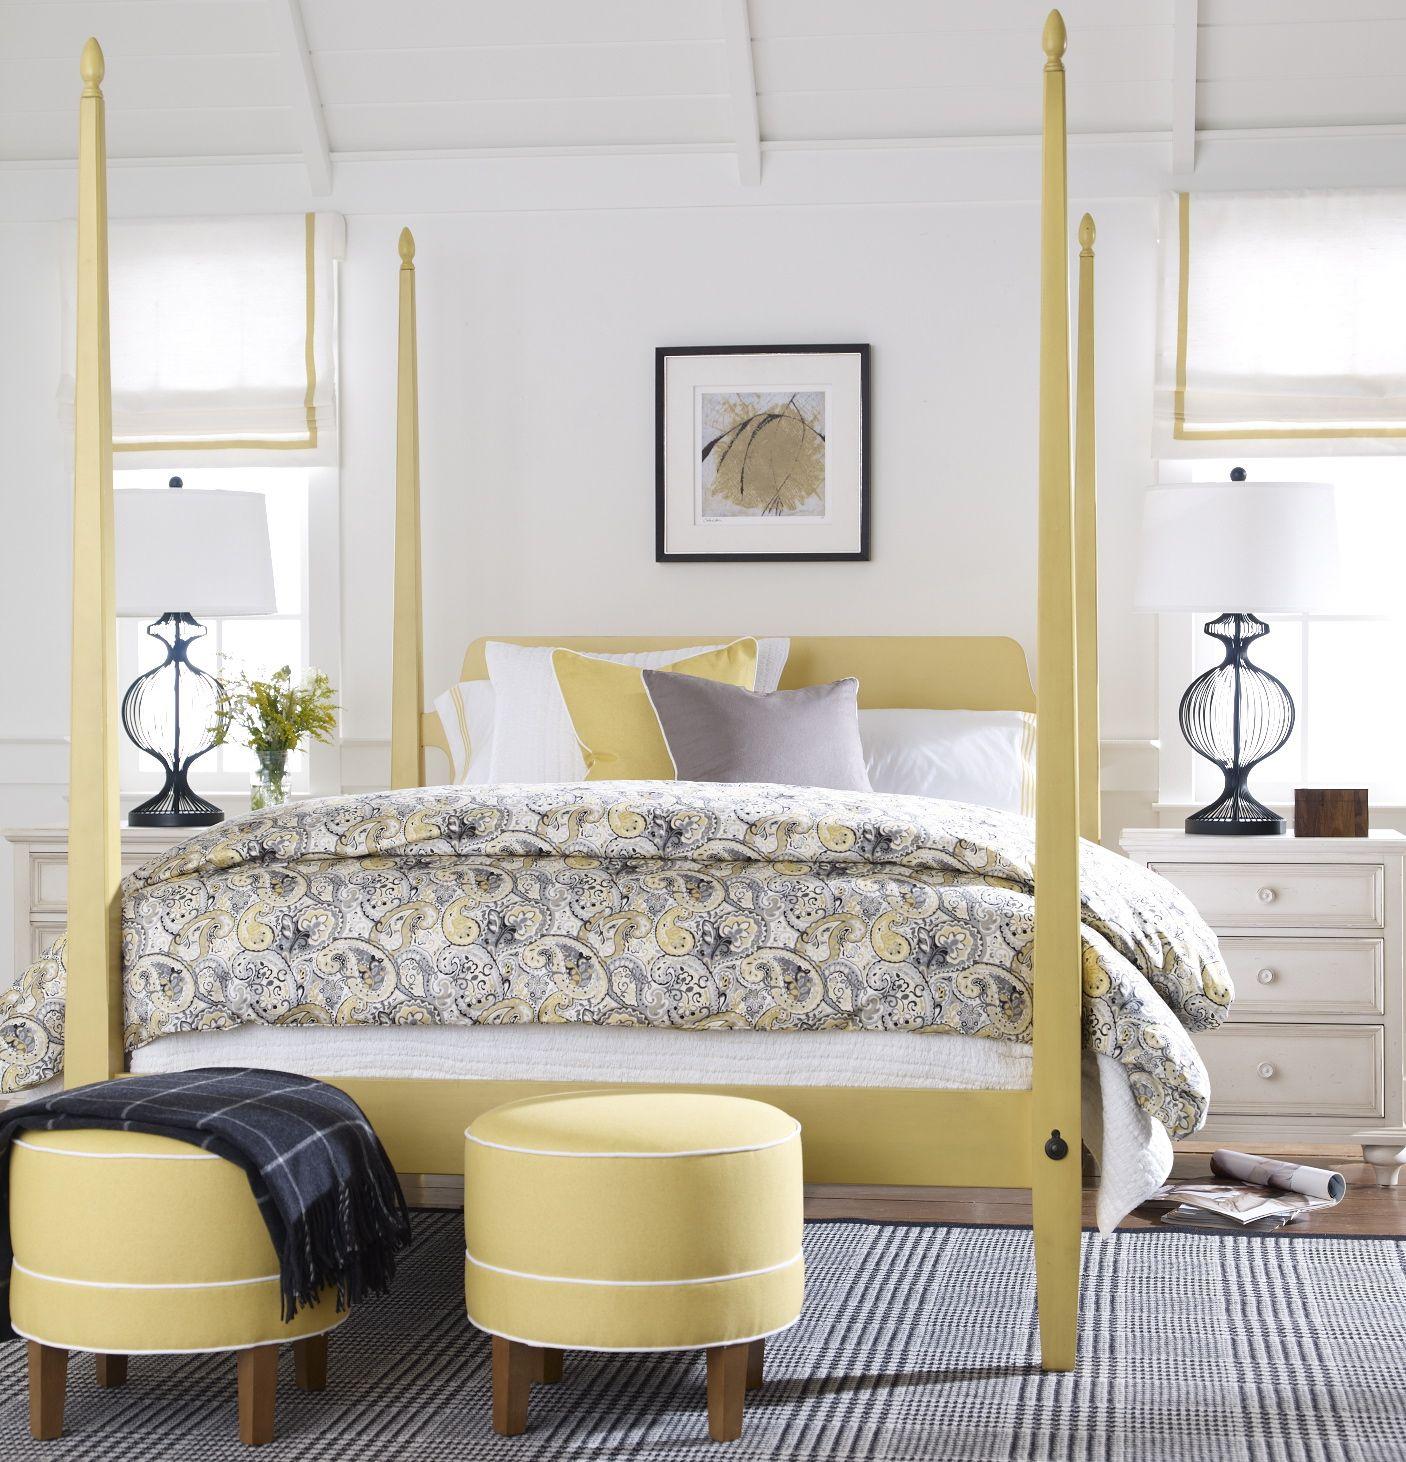 Wake up to sunshine. | Bed linens luxury, Yellow bedding ...